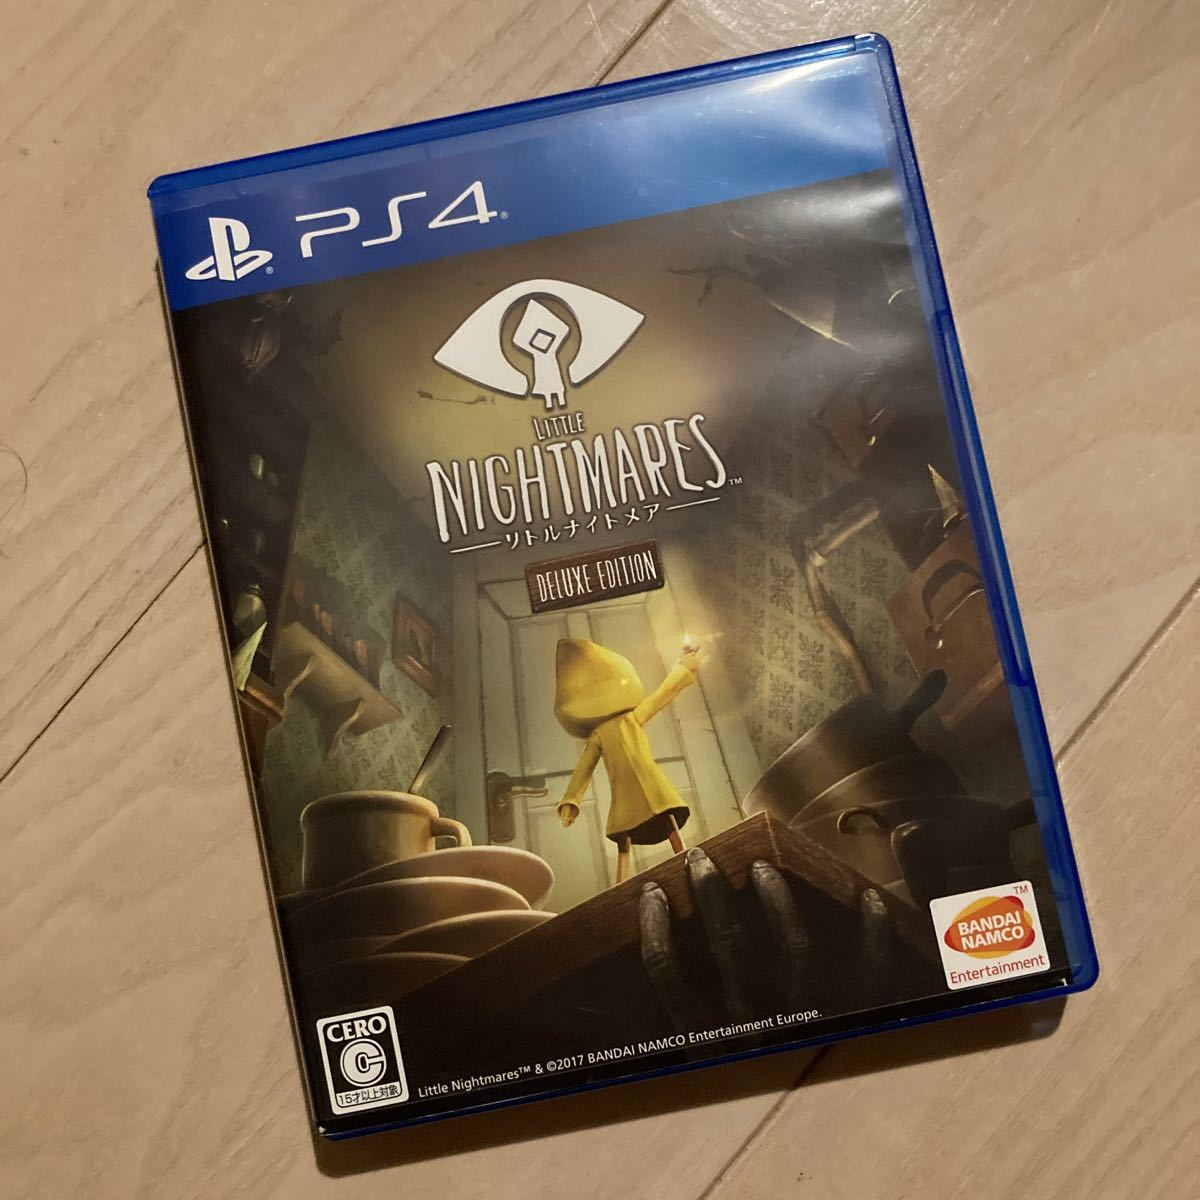 【PS4】 LITTLE NIGHTMARES -リトルナイトメア- [Deluxe Edition]